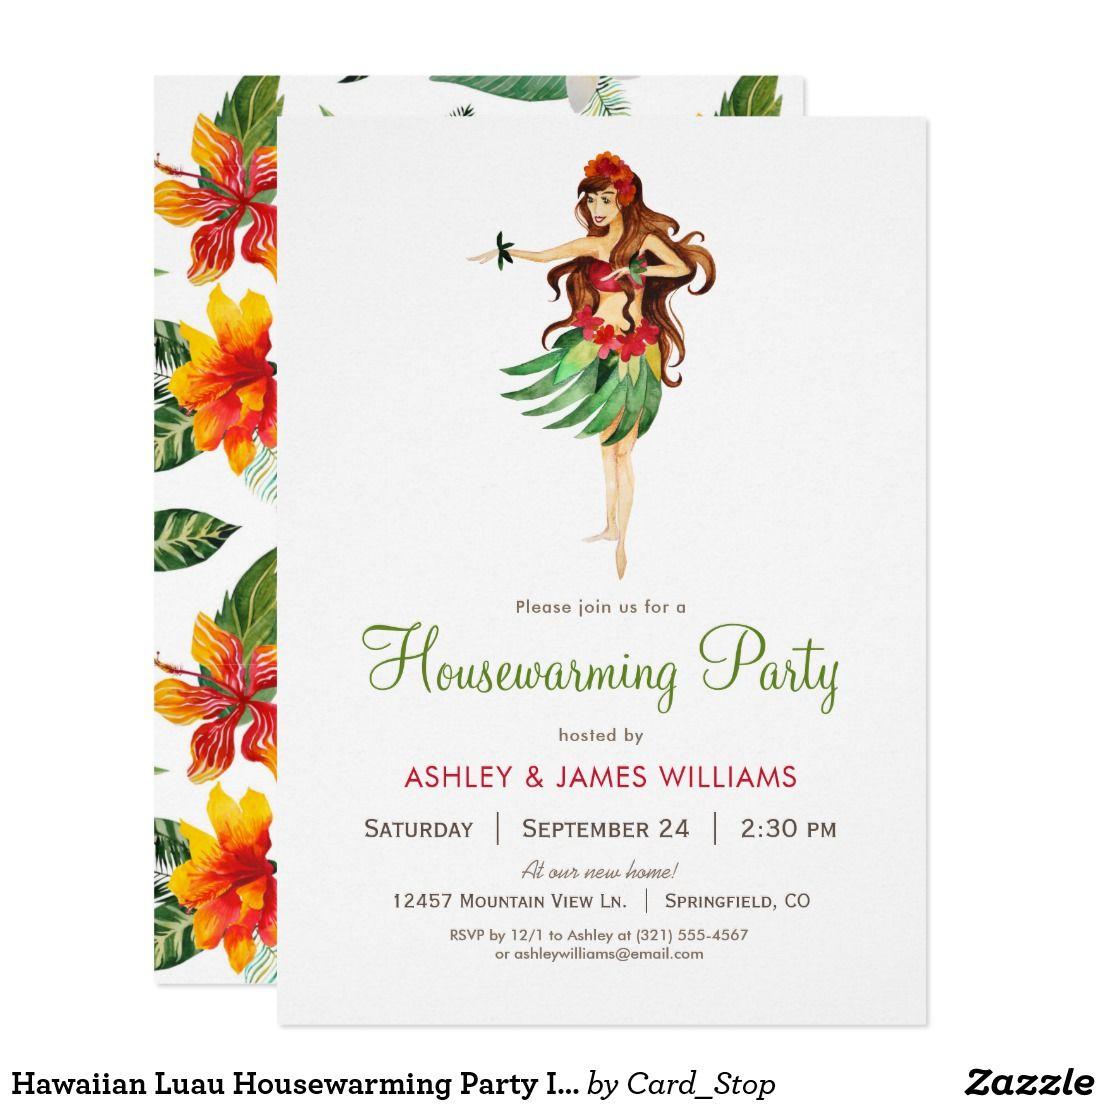 Hawaiian Luau Housewarming Party Invitation Products I Admire